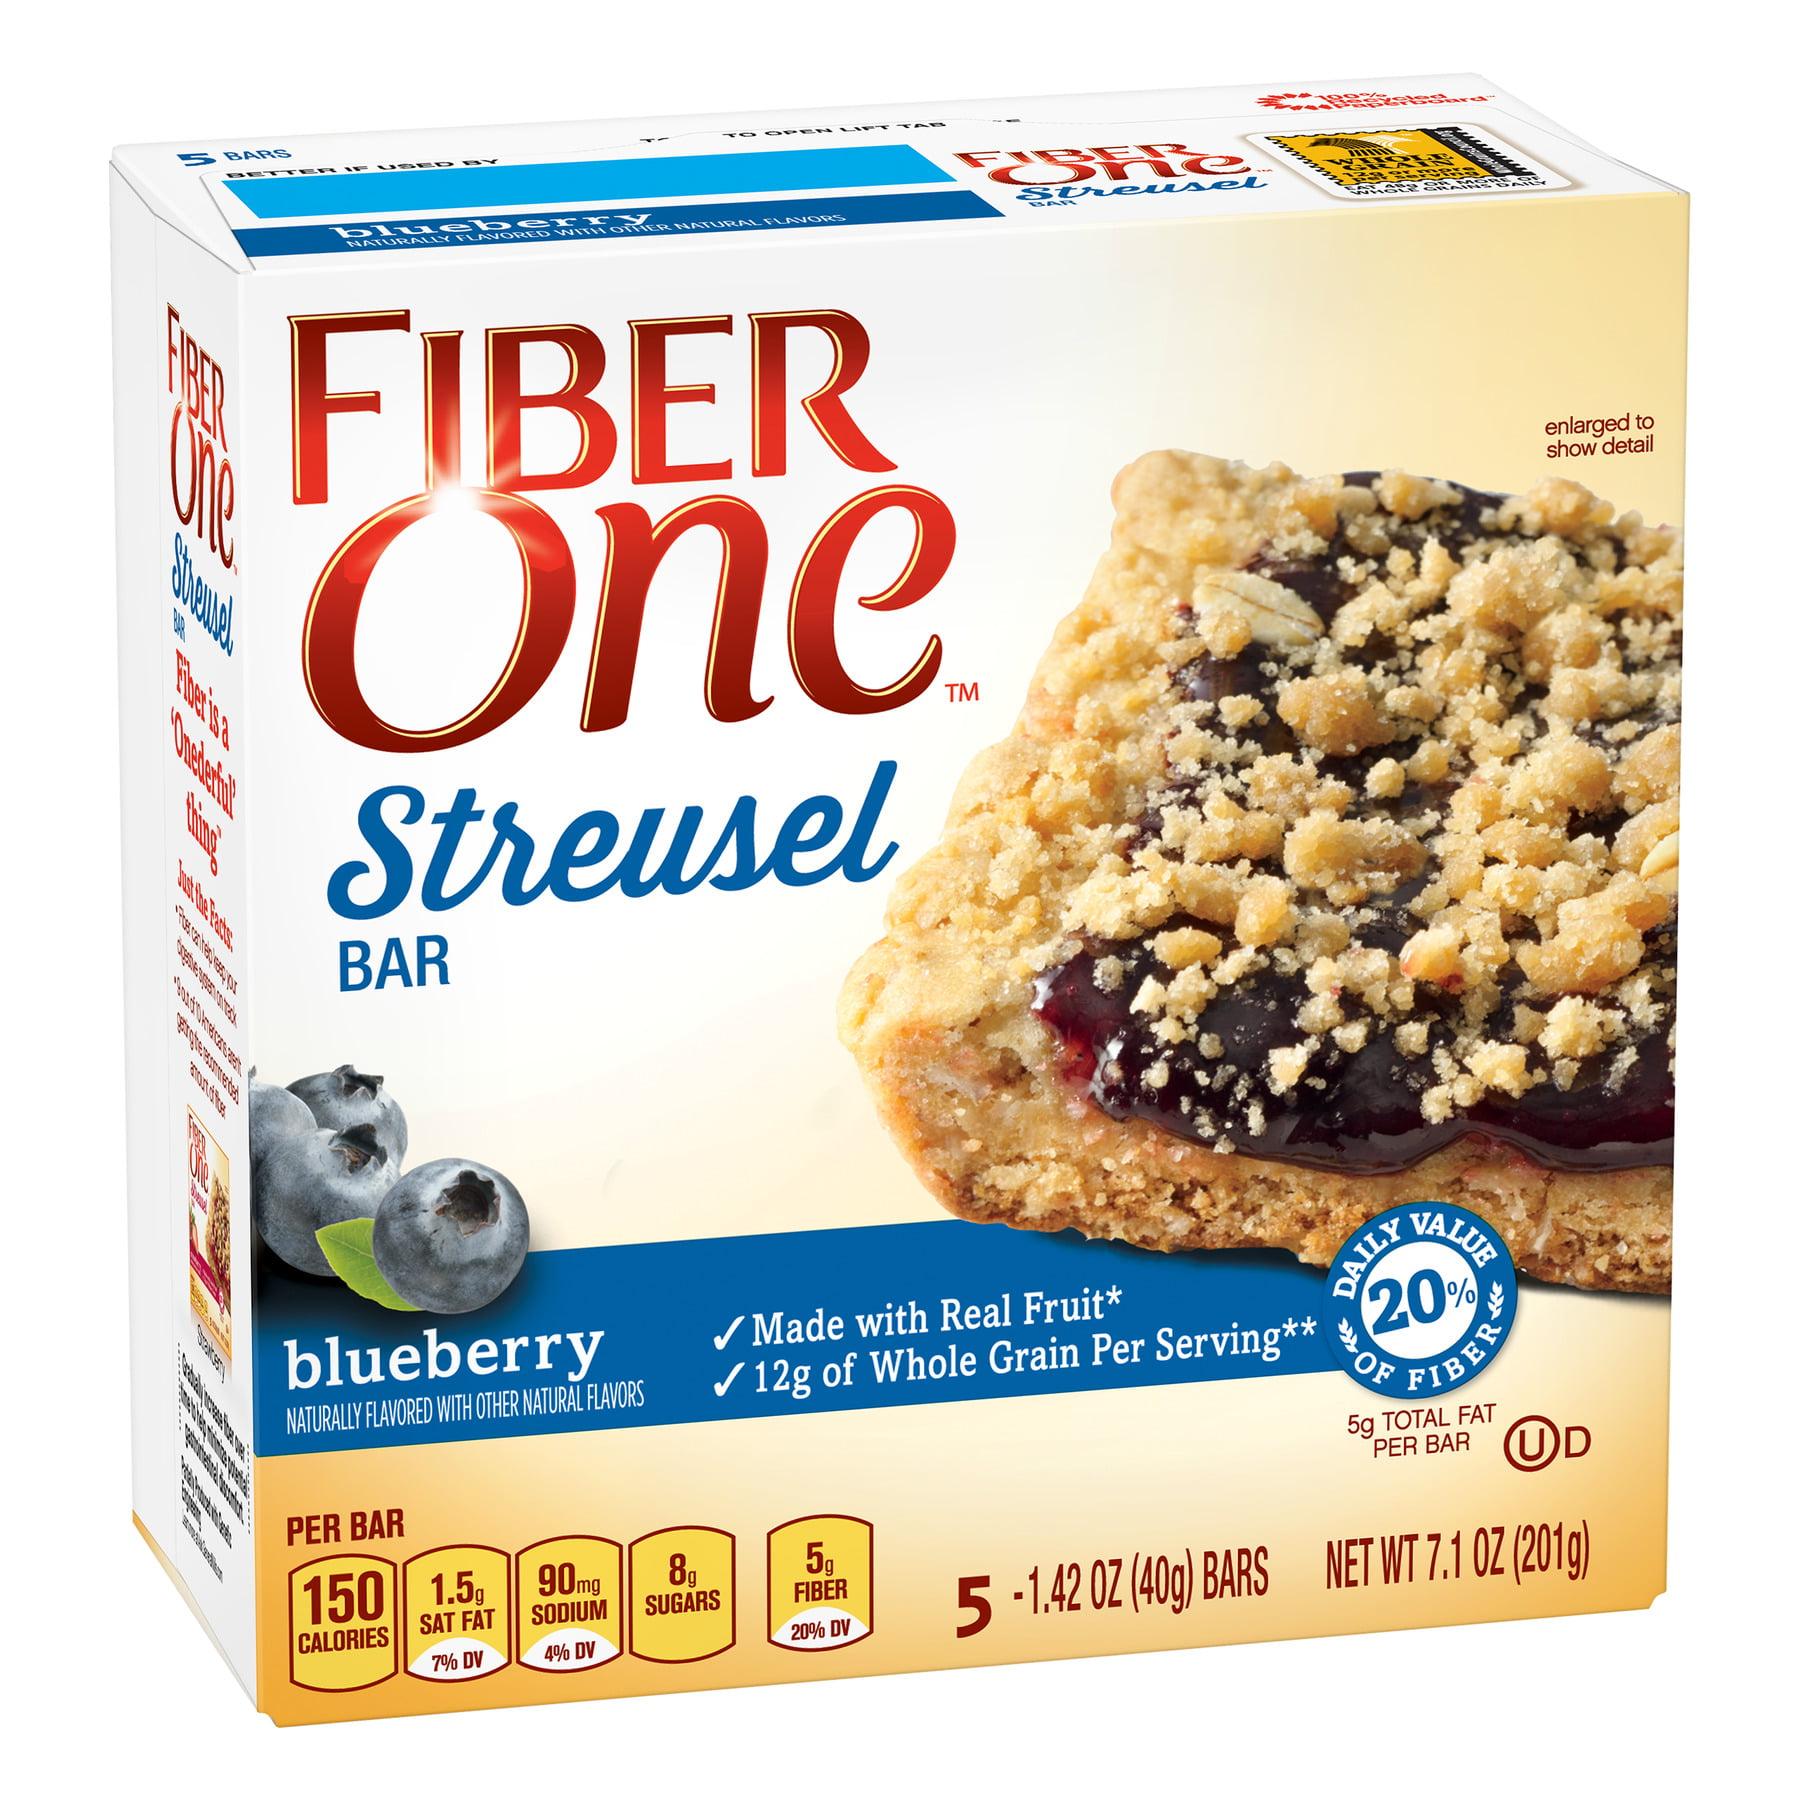 Fiber One Blueberry Streusel Bar, 7.1 oz Box